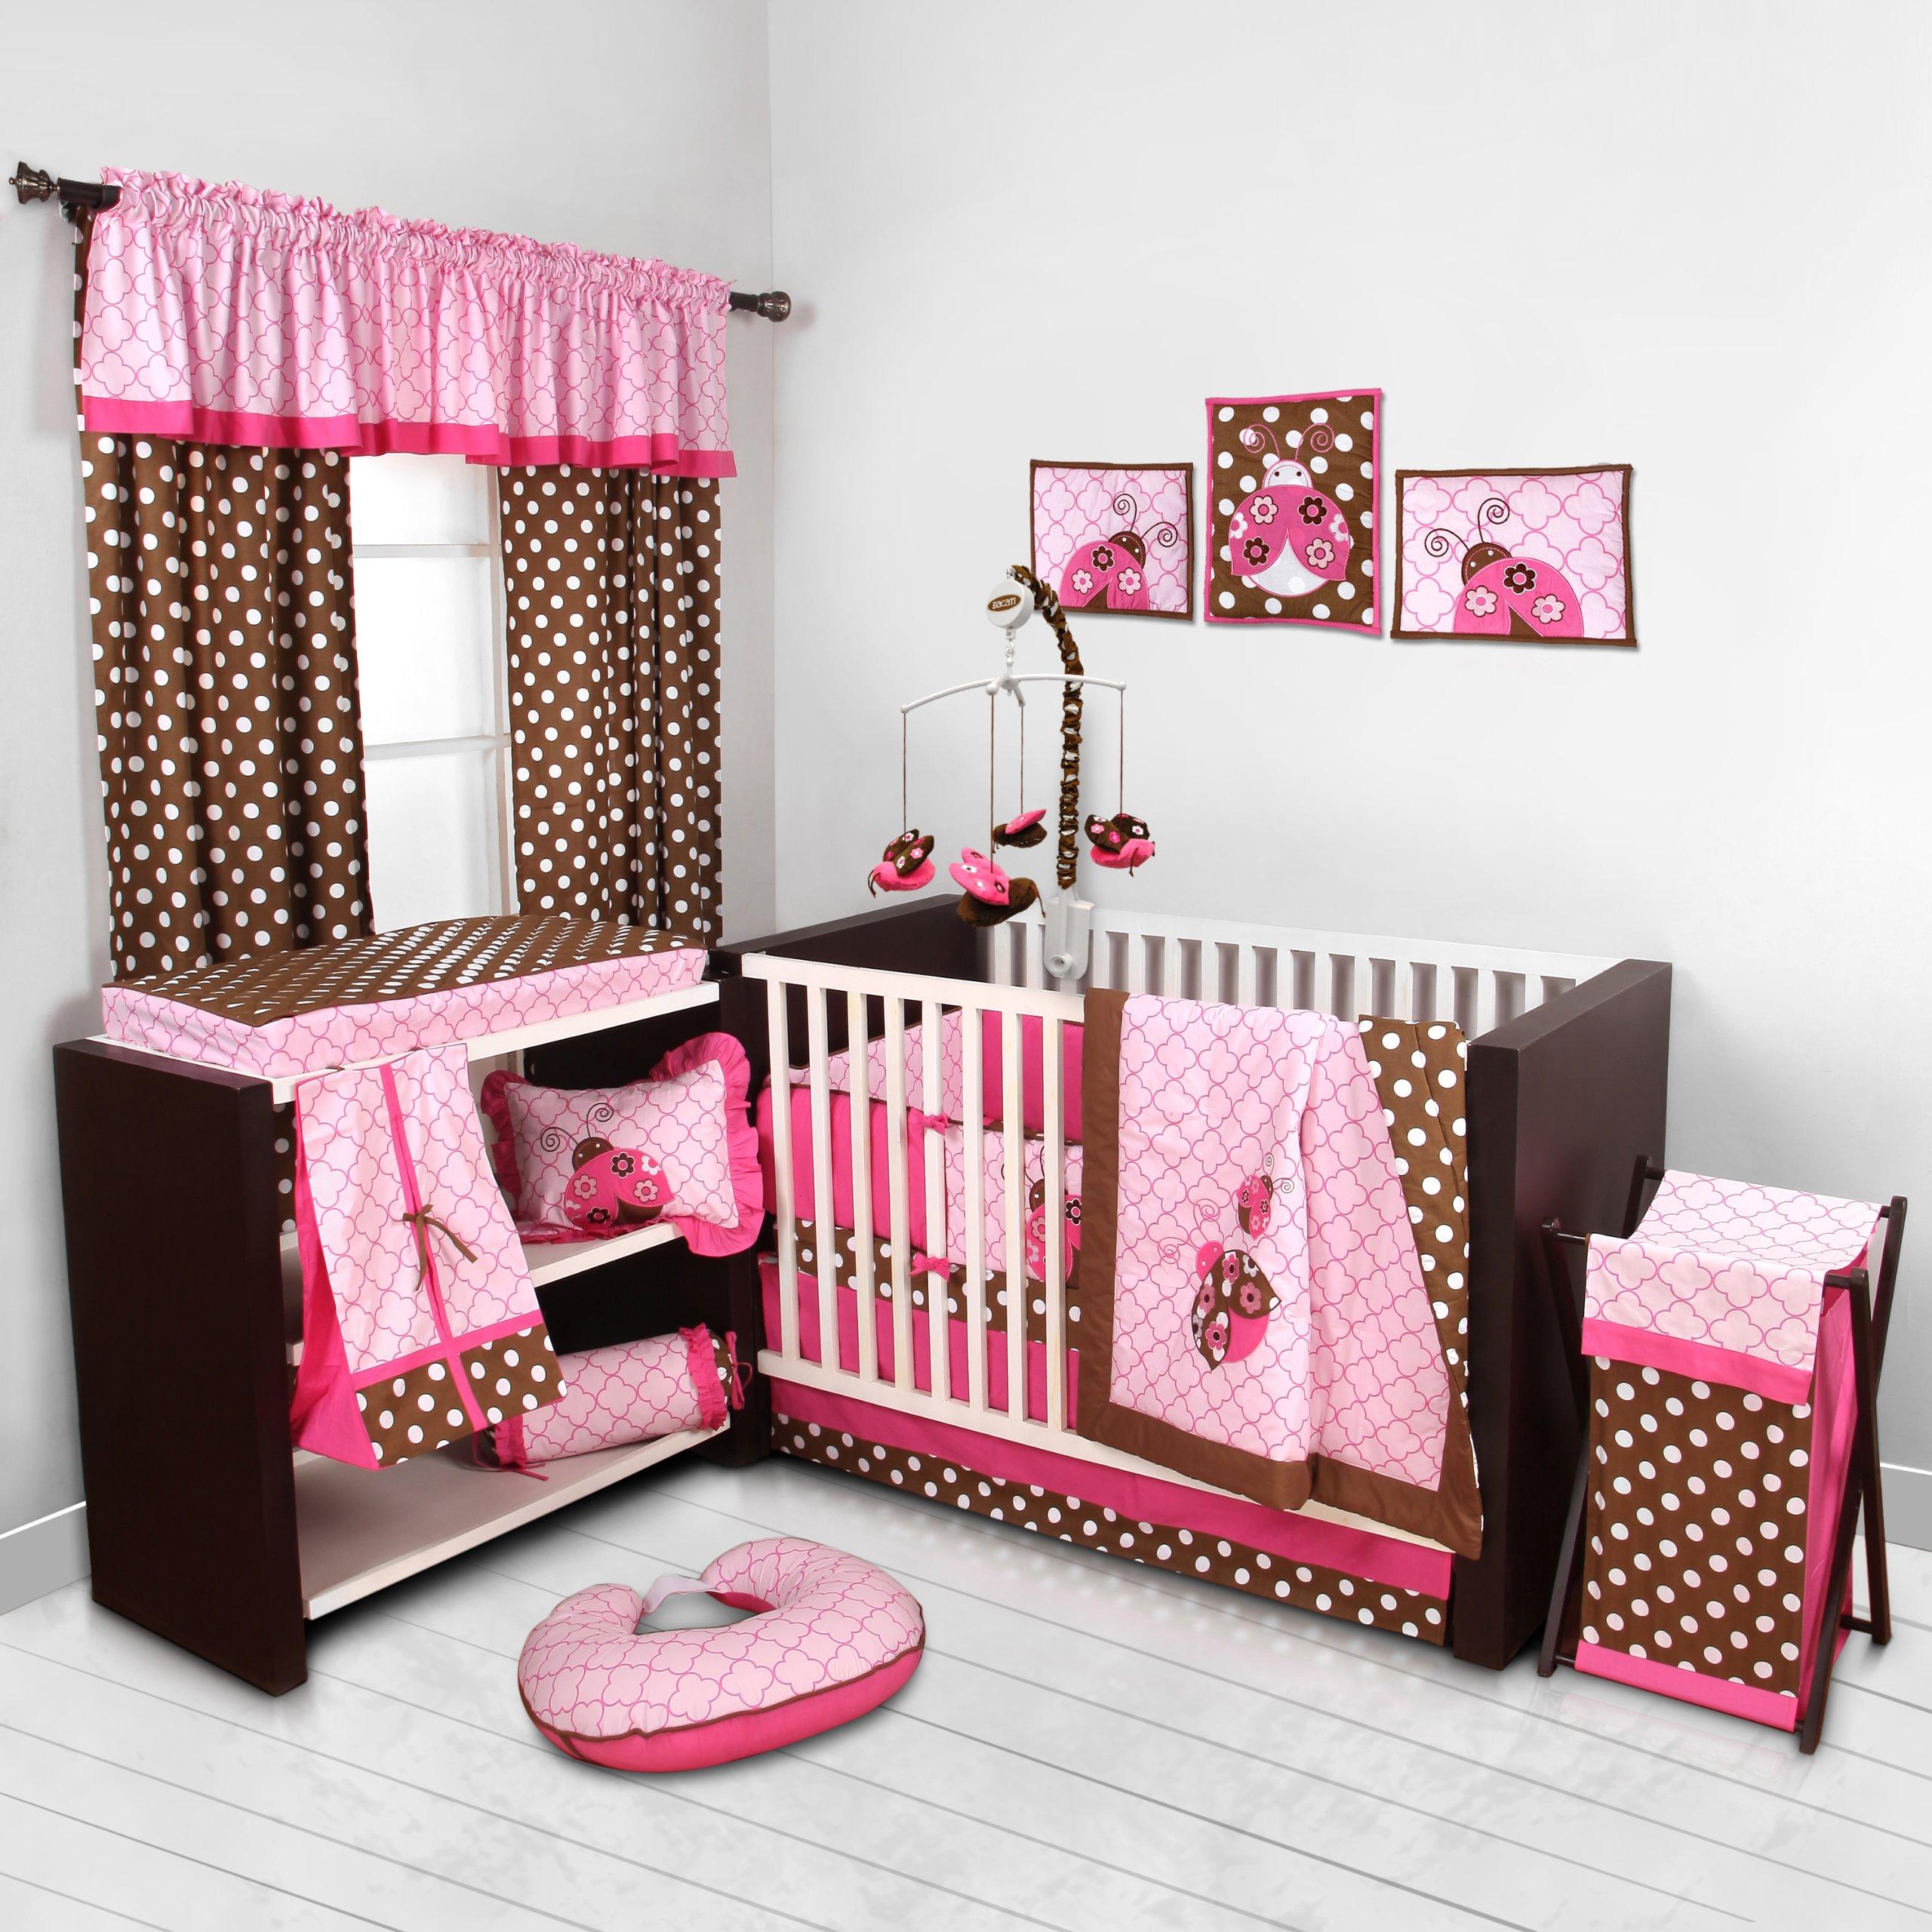 Lady Bugs pink/chocolate 10 pc Crib Set